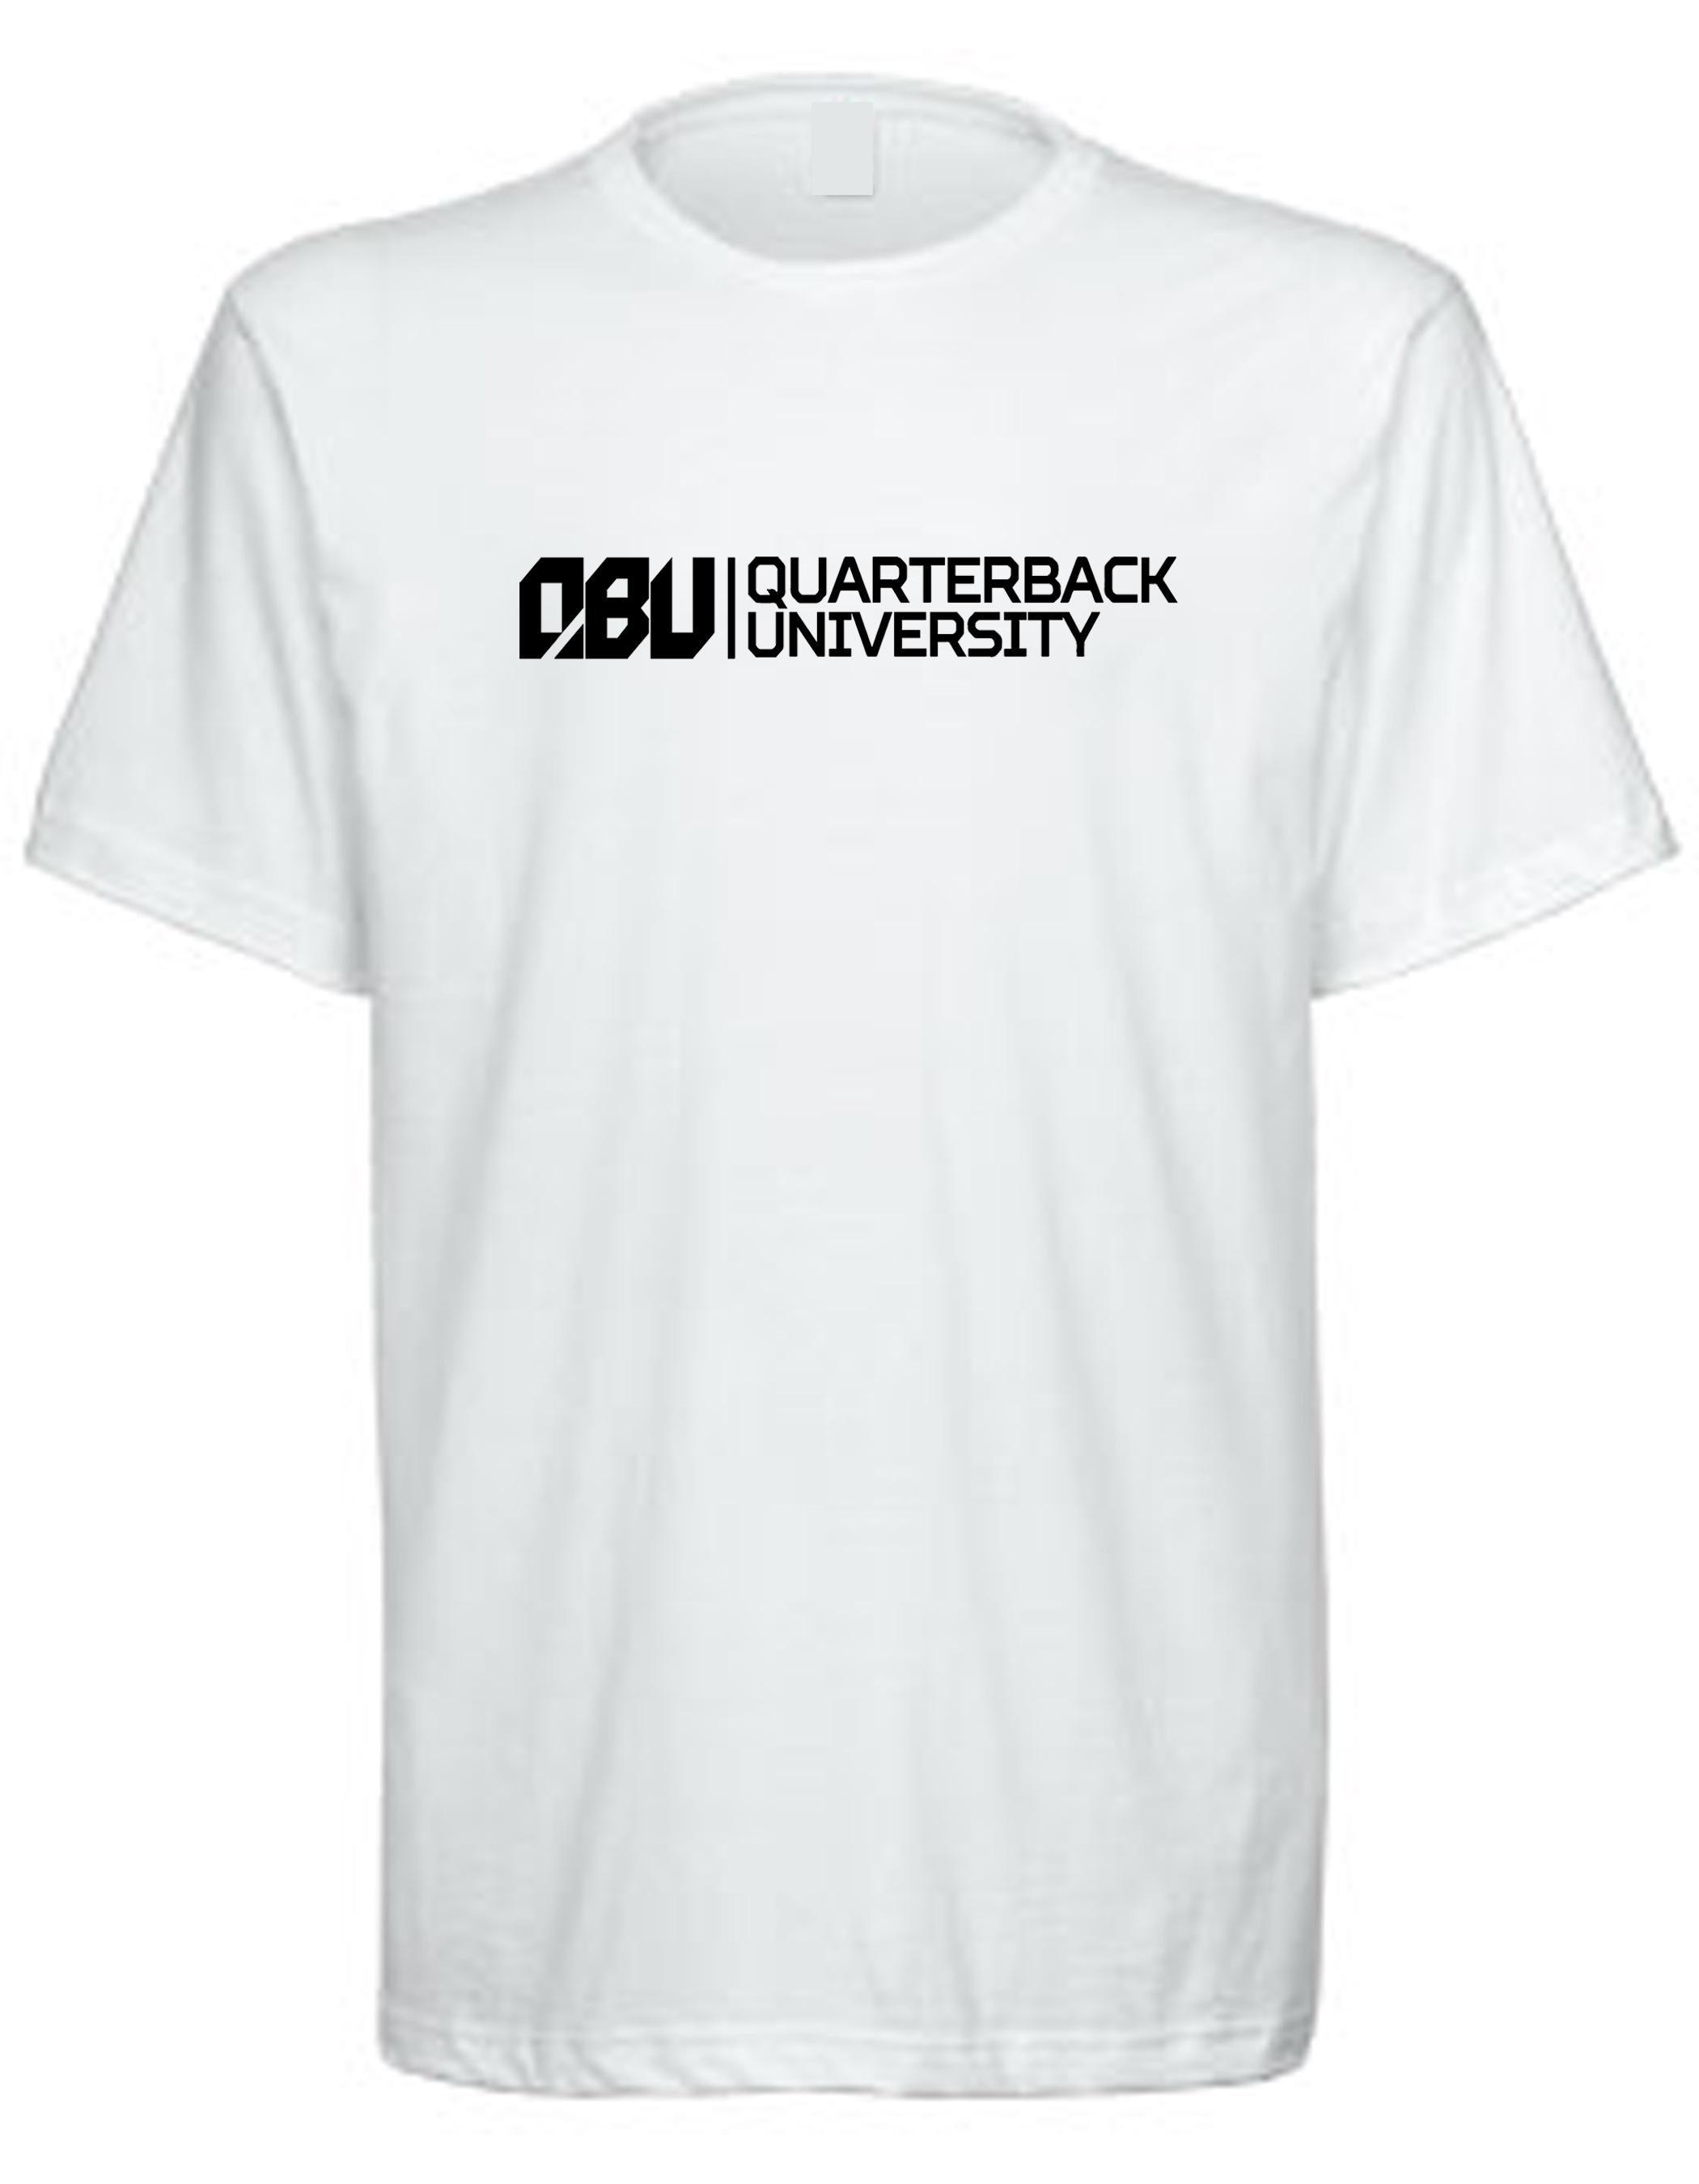 Quarterback University Tee White